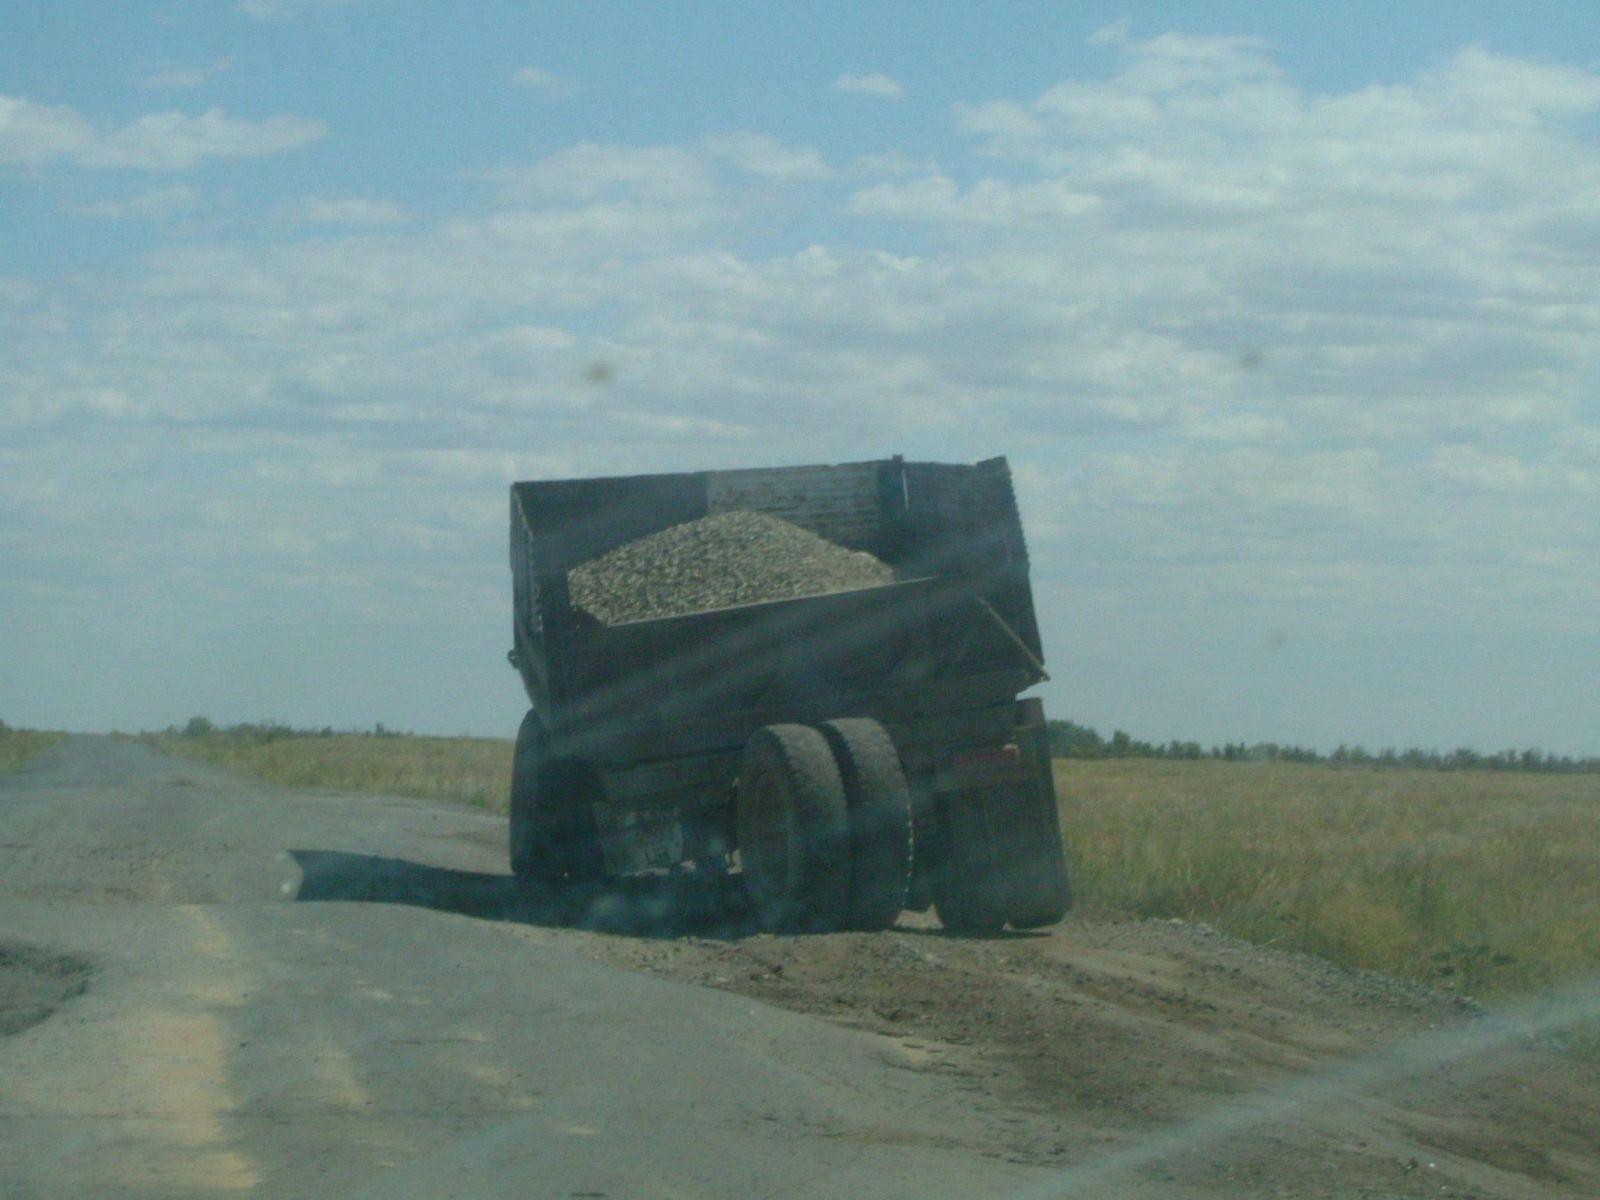 Kazakhstan Bad Roads